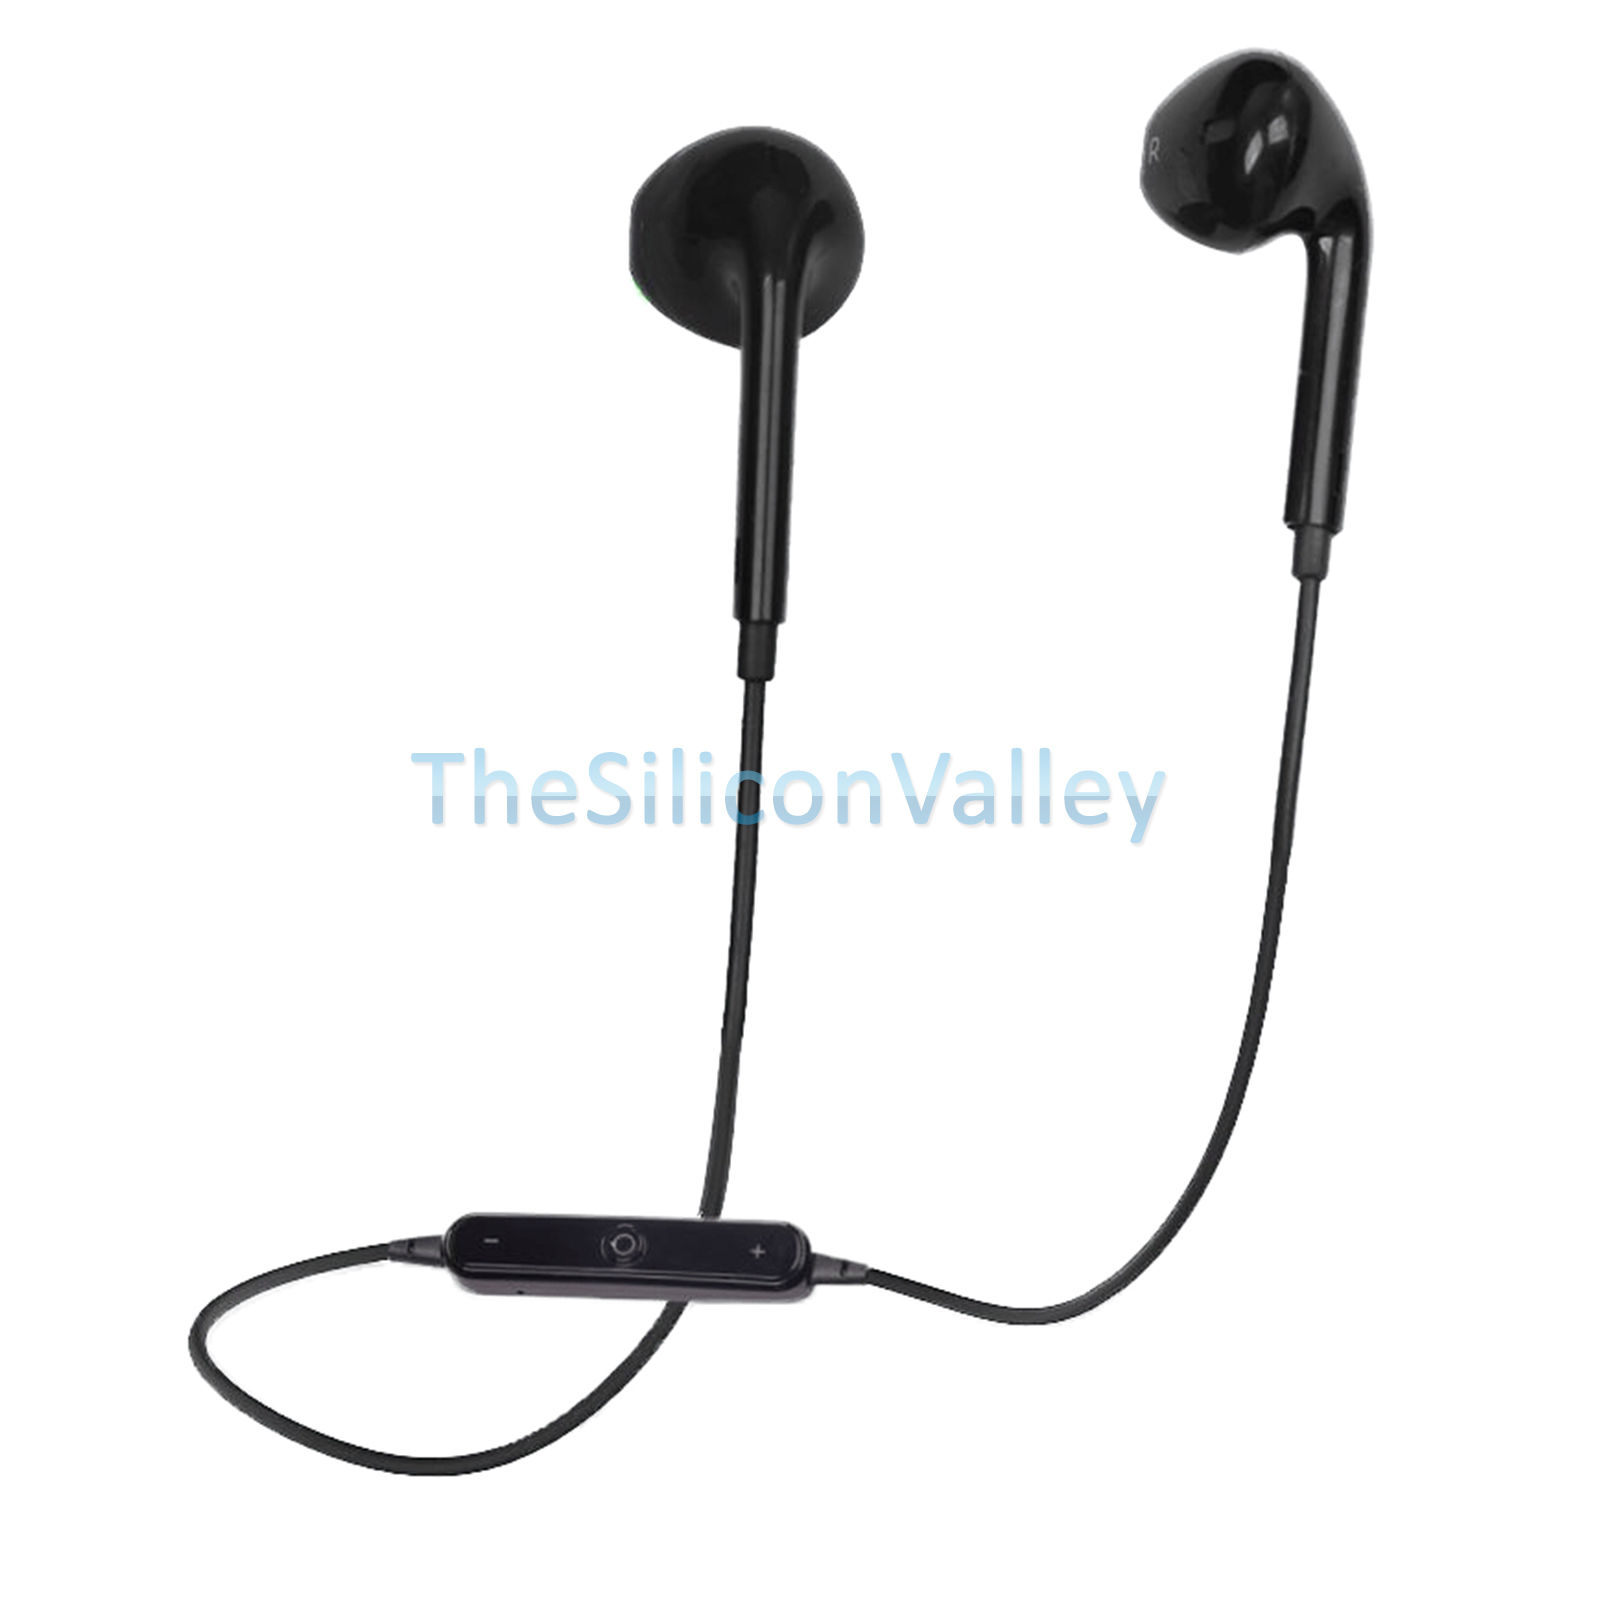 Wireless bluetooth earbuds lg - bluetooth earbuds iphone x wireless